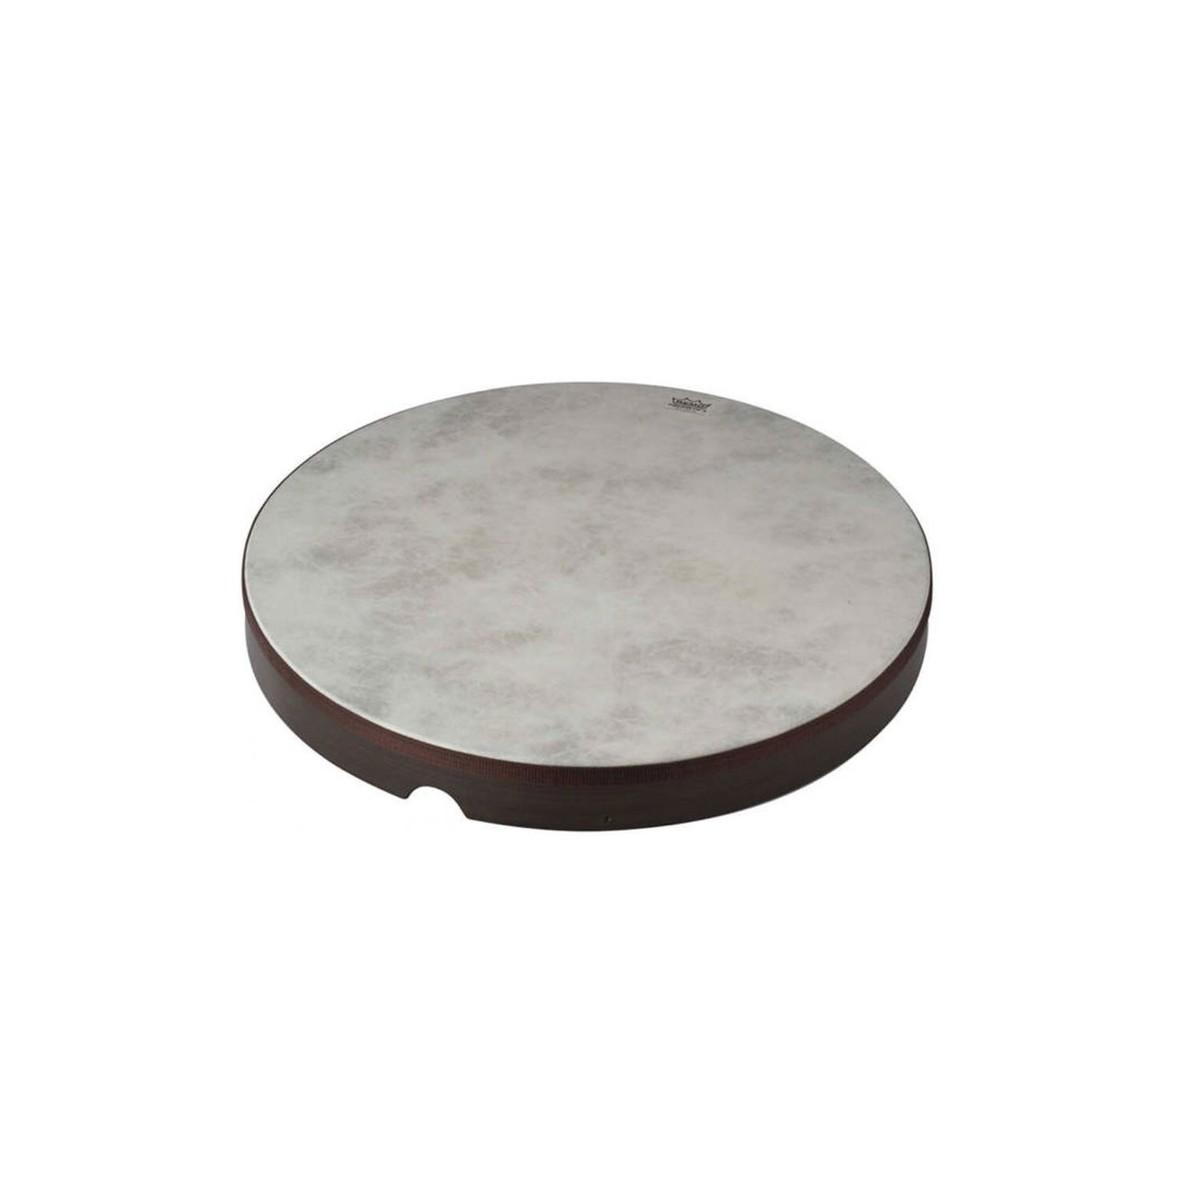 Remo Pre Tuned Hand Drum w/ Fiberskyn Head 8 x 2\